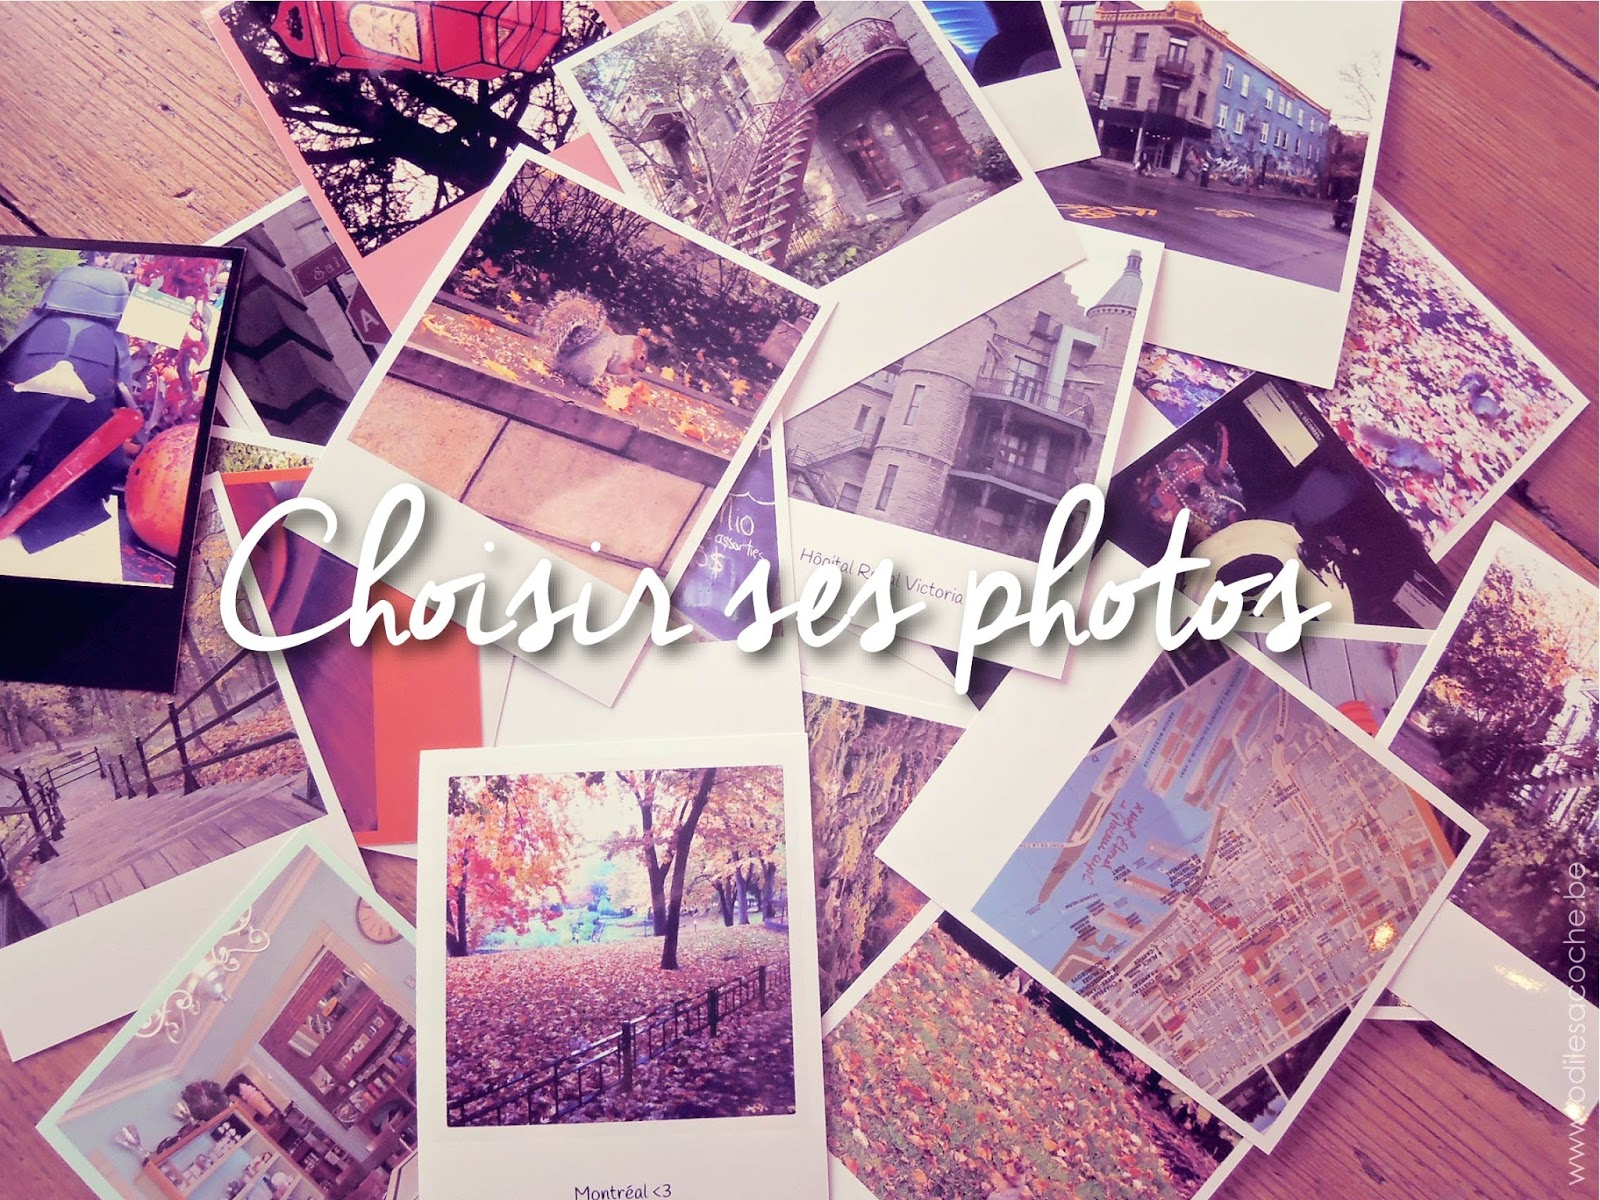 photos imprimés via printic